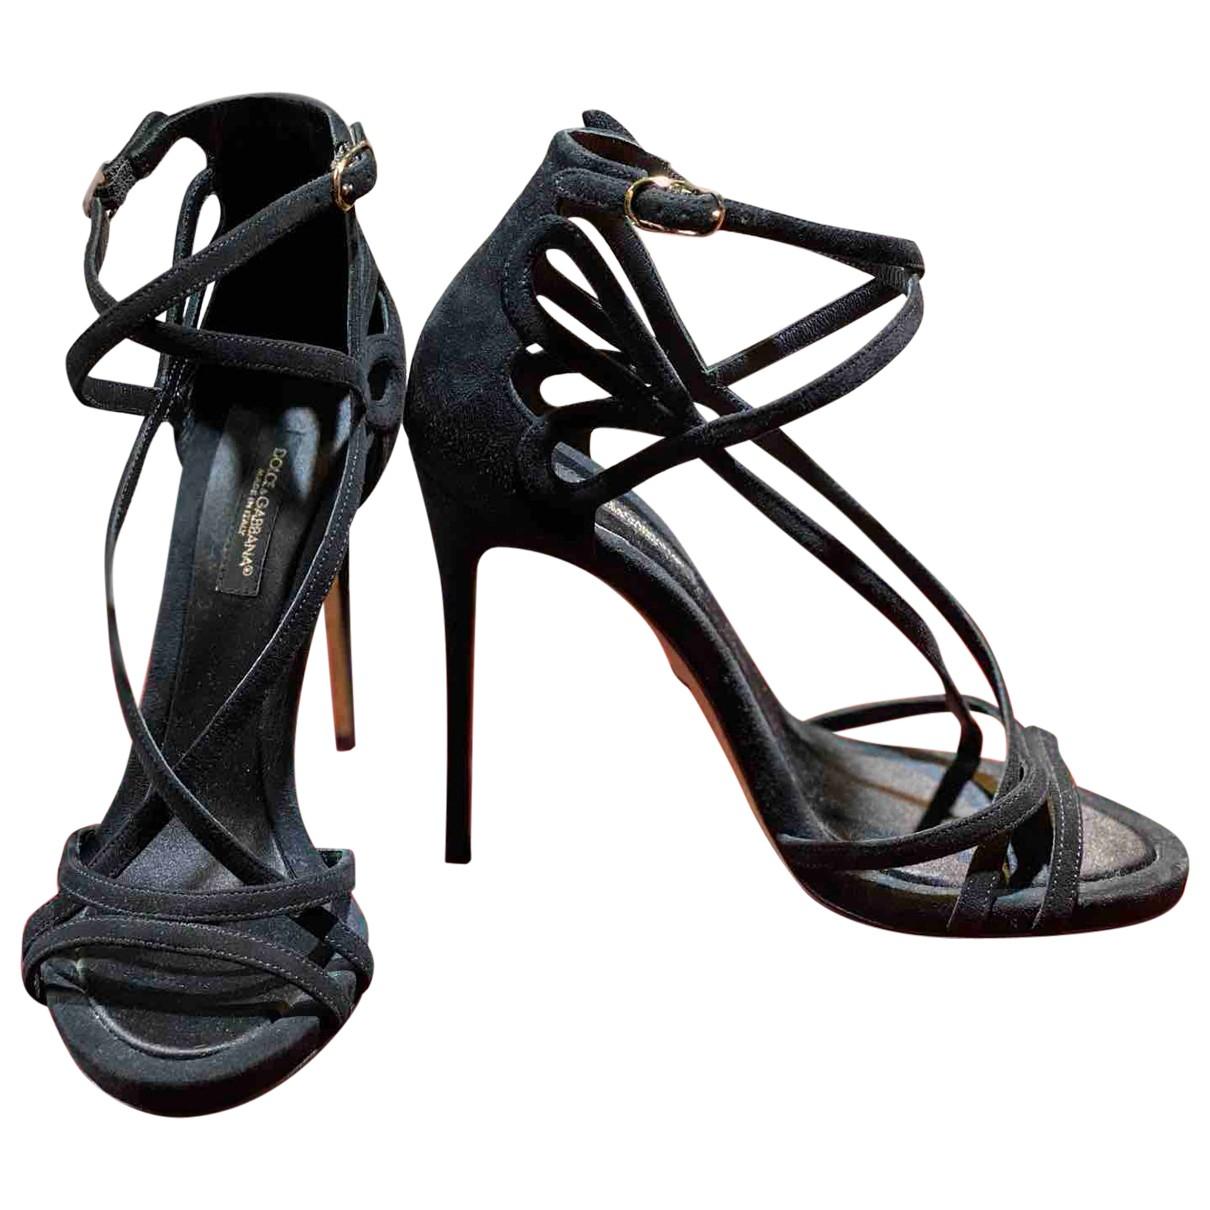 Dolce & Gabbana N Black Suede Sandals for Women 35 EU